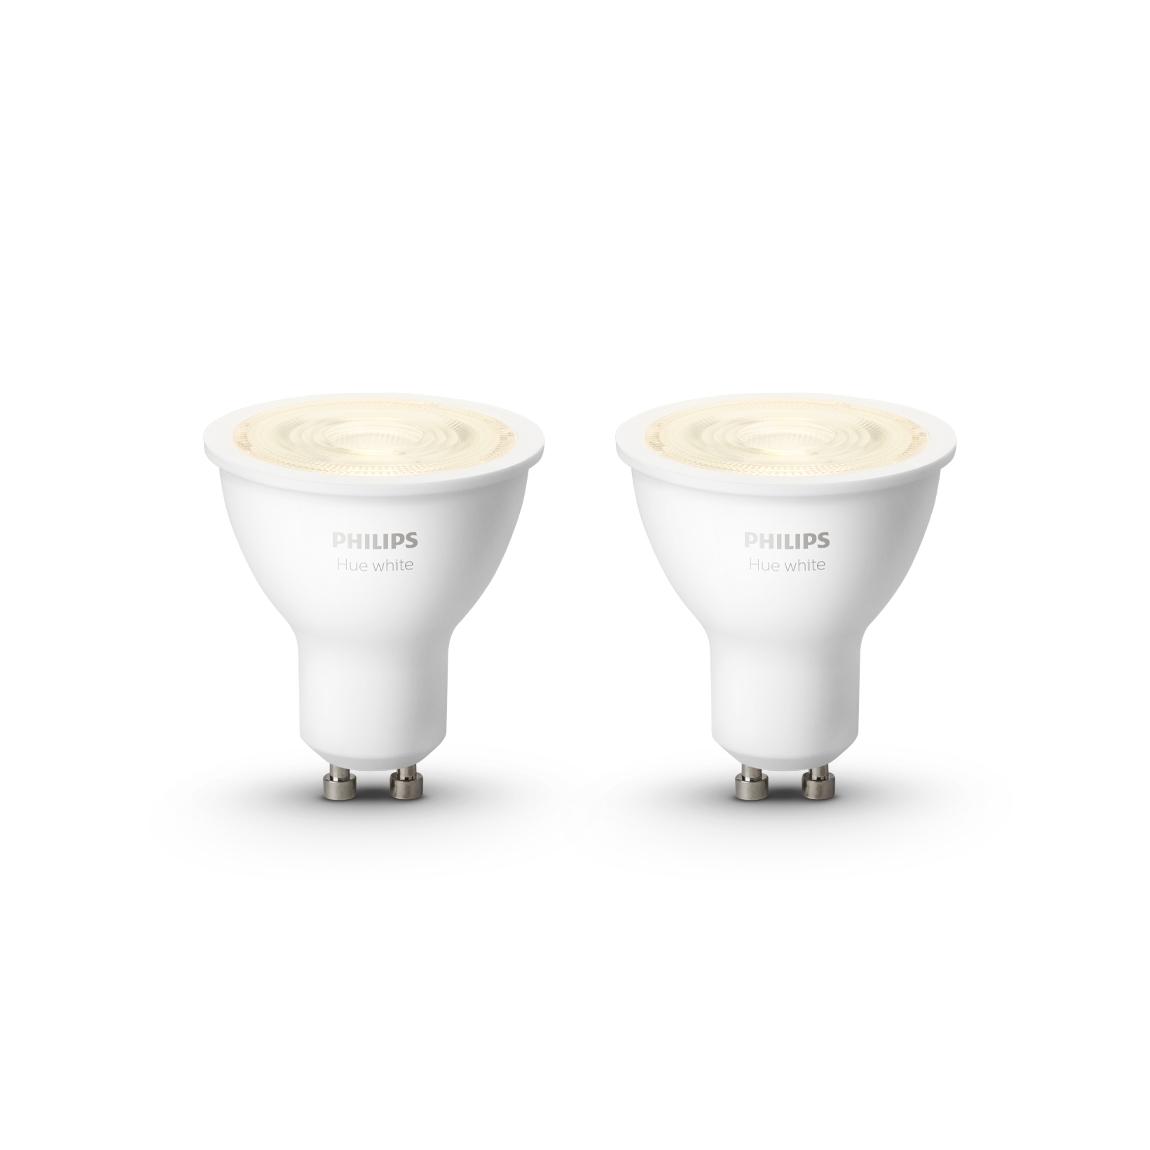 Philips Hue White GU10 Bluetooth 2er Set - LED-Spot - Weiß